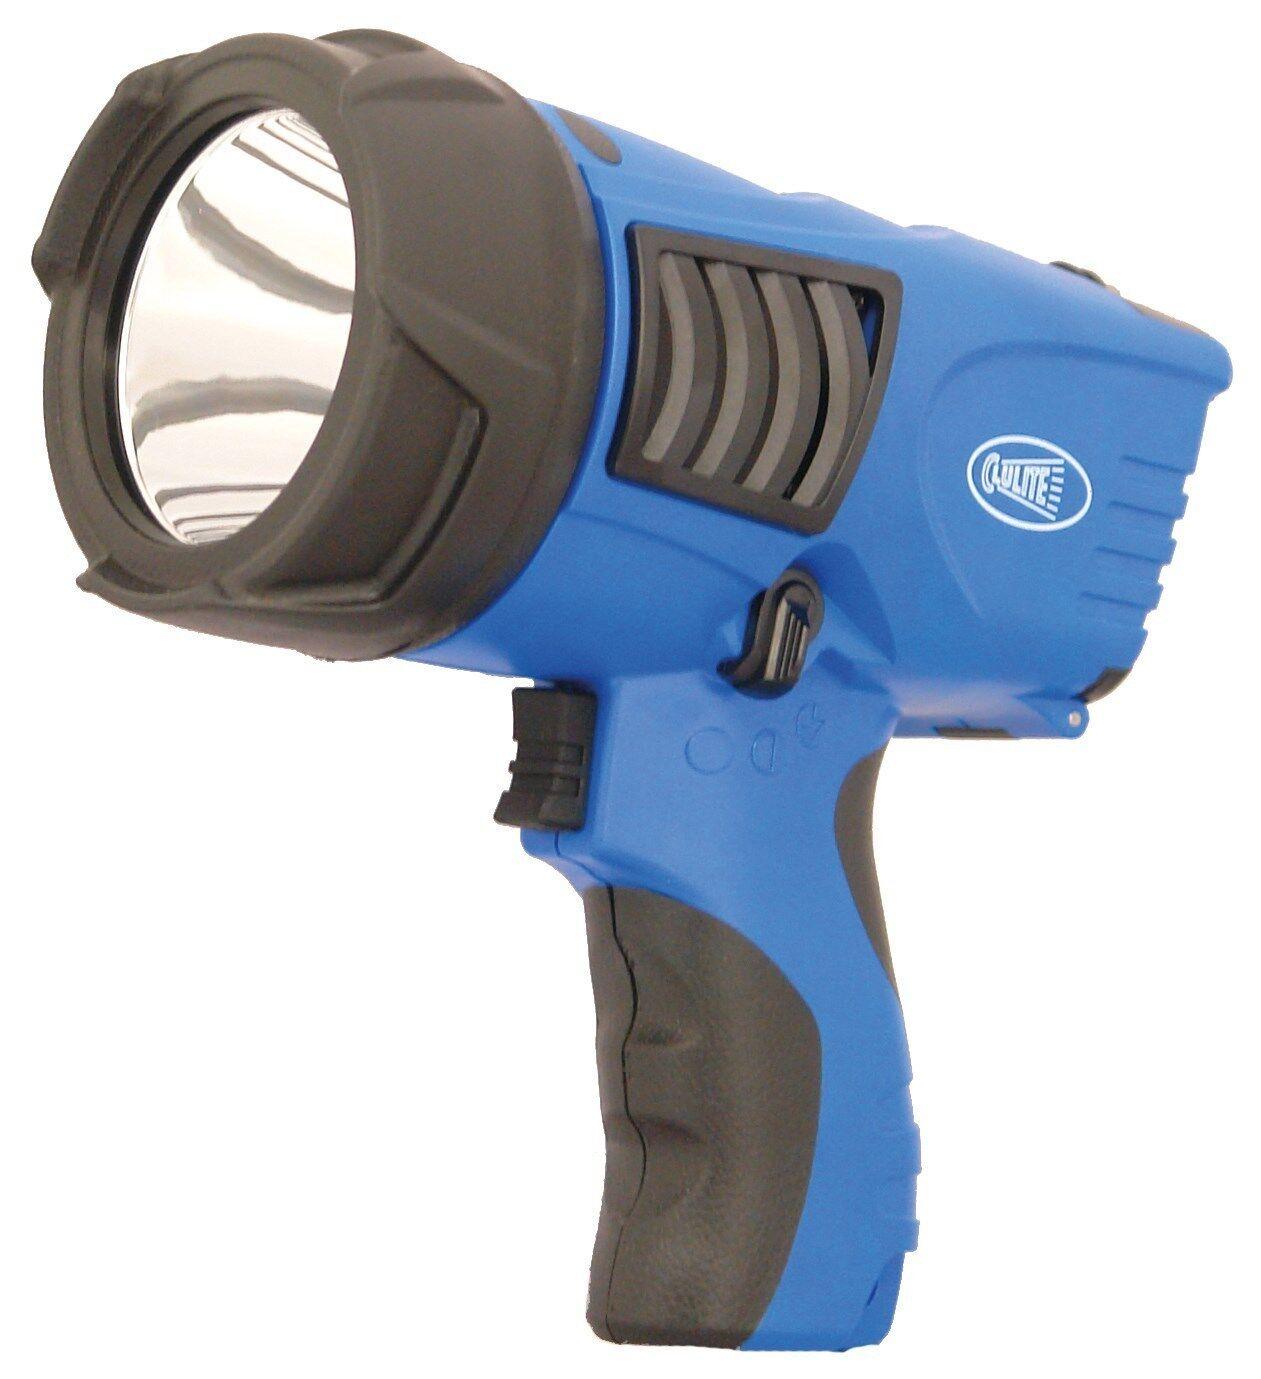 CLUSON CLU-BRITER CREE LED SPOTLIGHT 500 LUMEN 600M blueE TORCH